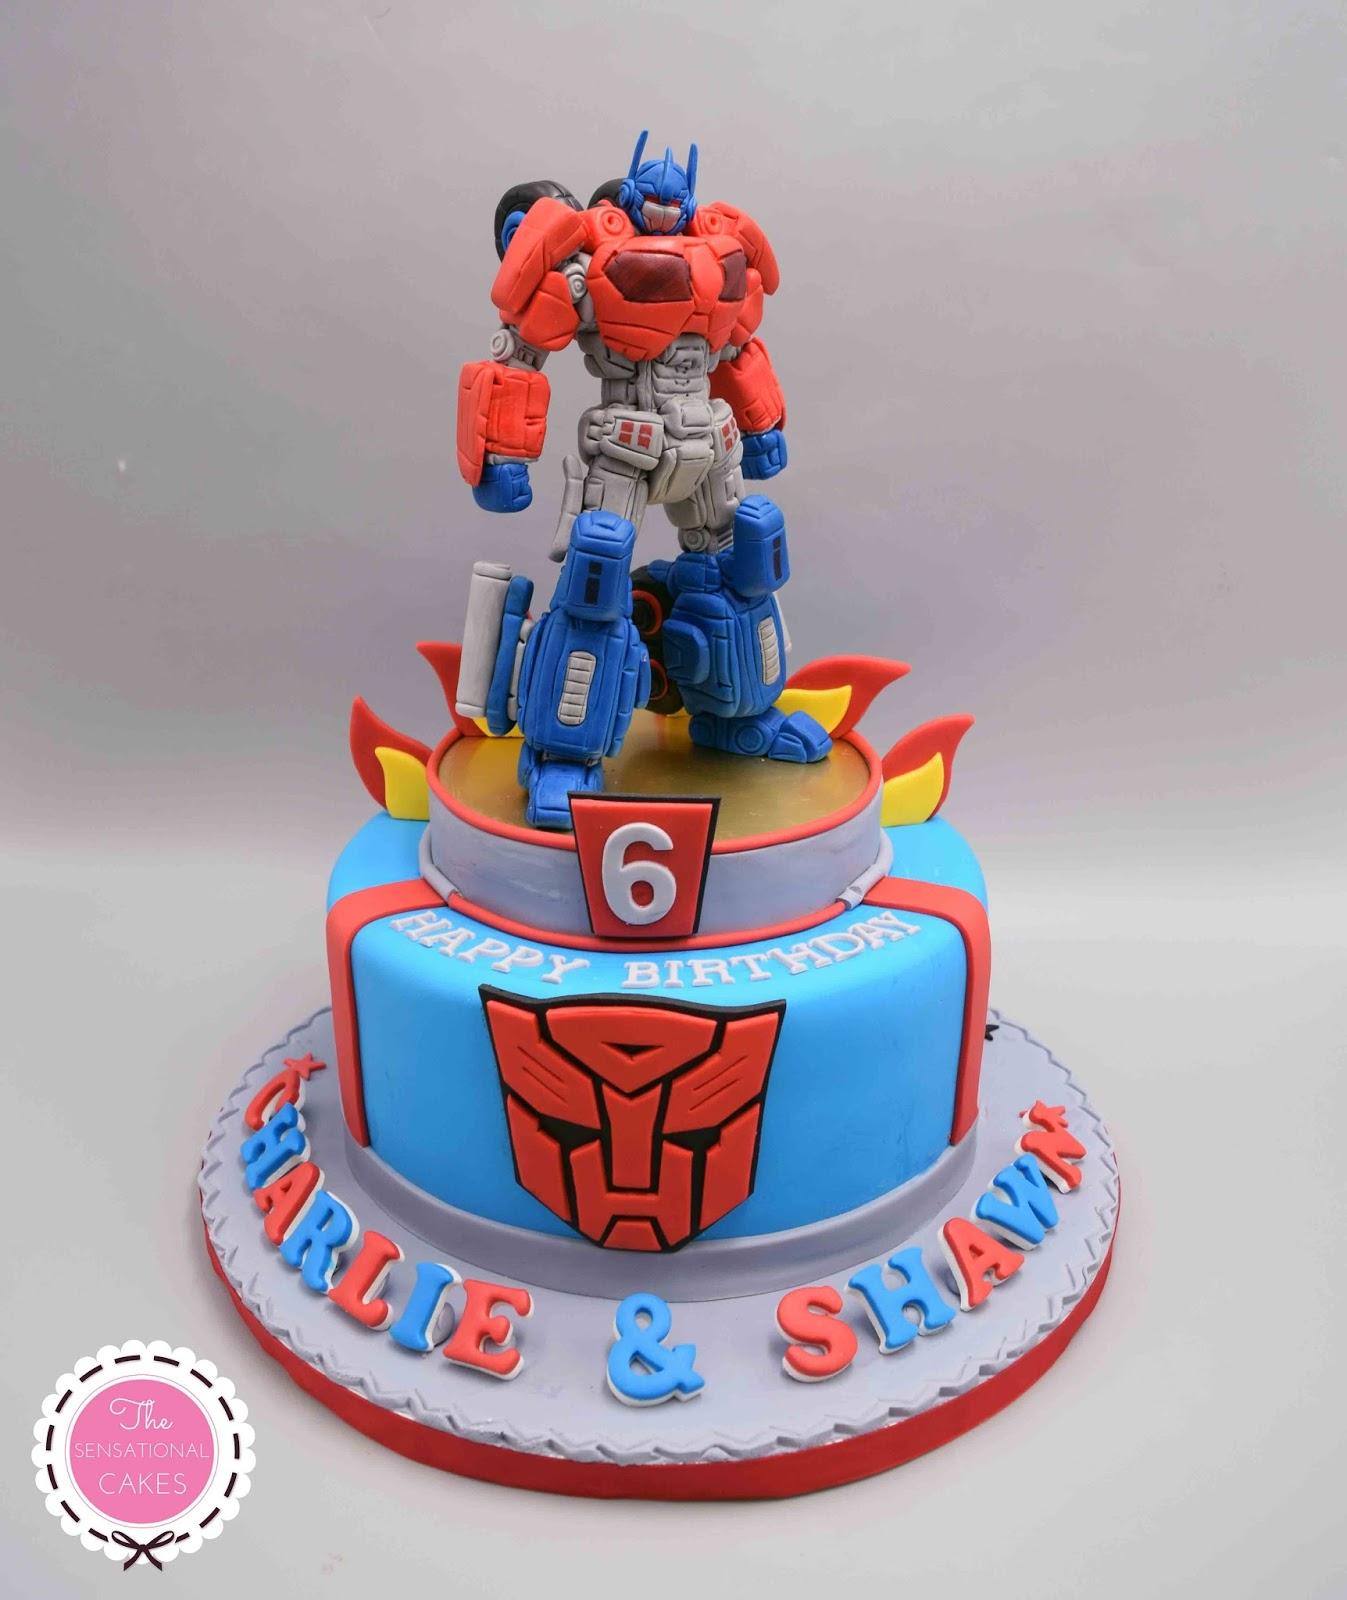 The Sensational Cakes Transformers Theme 3d Birthday Cake